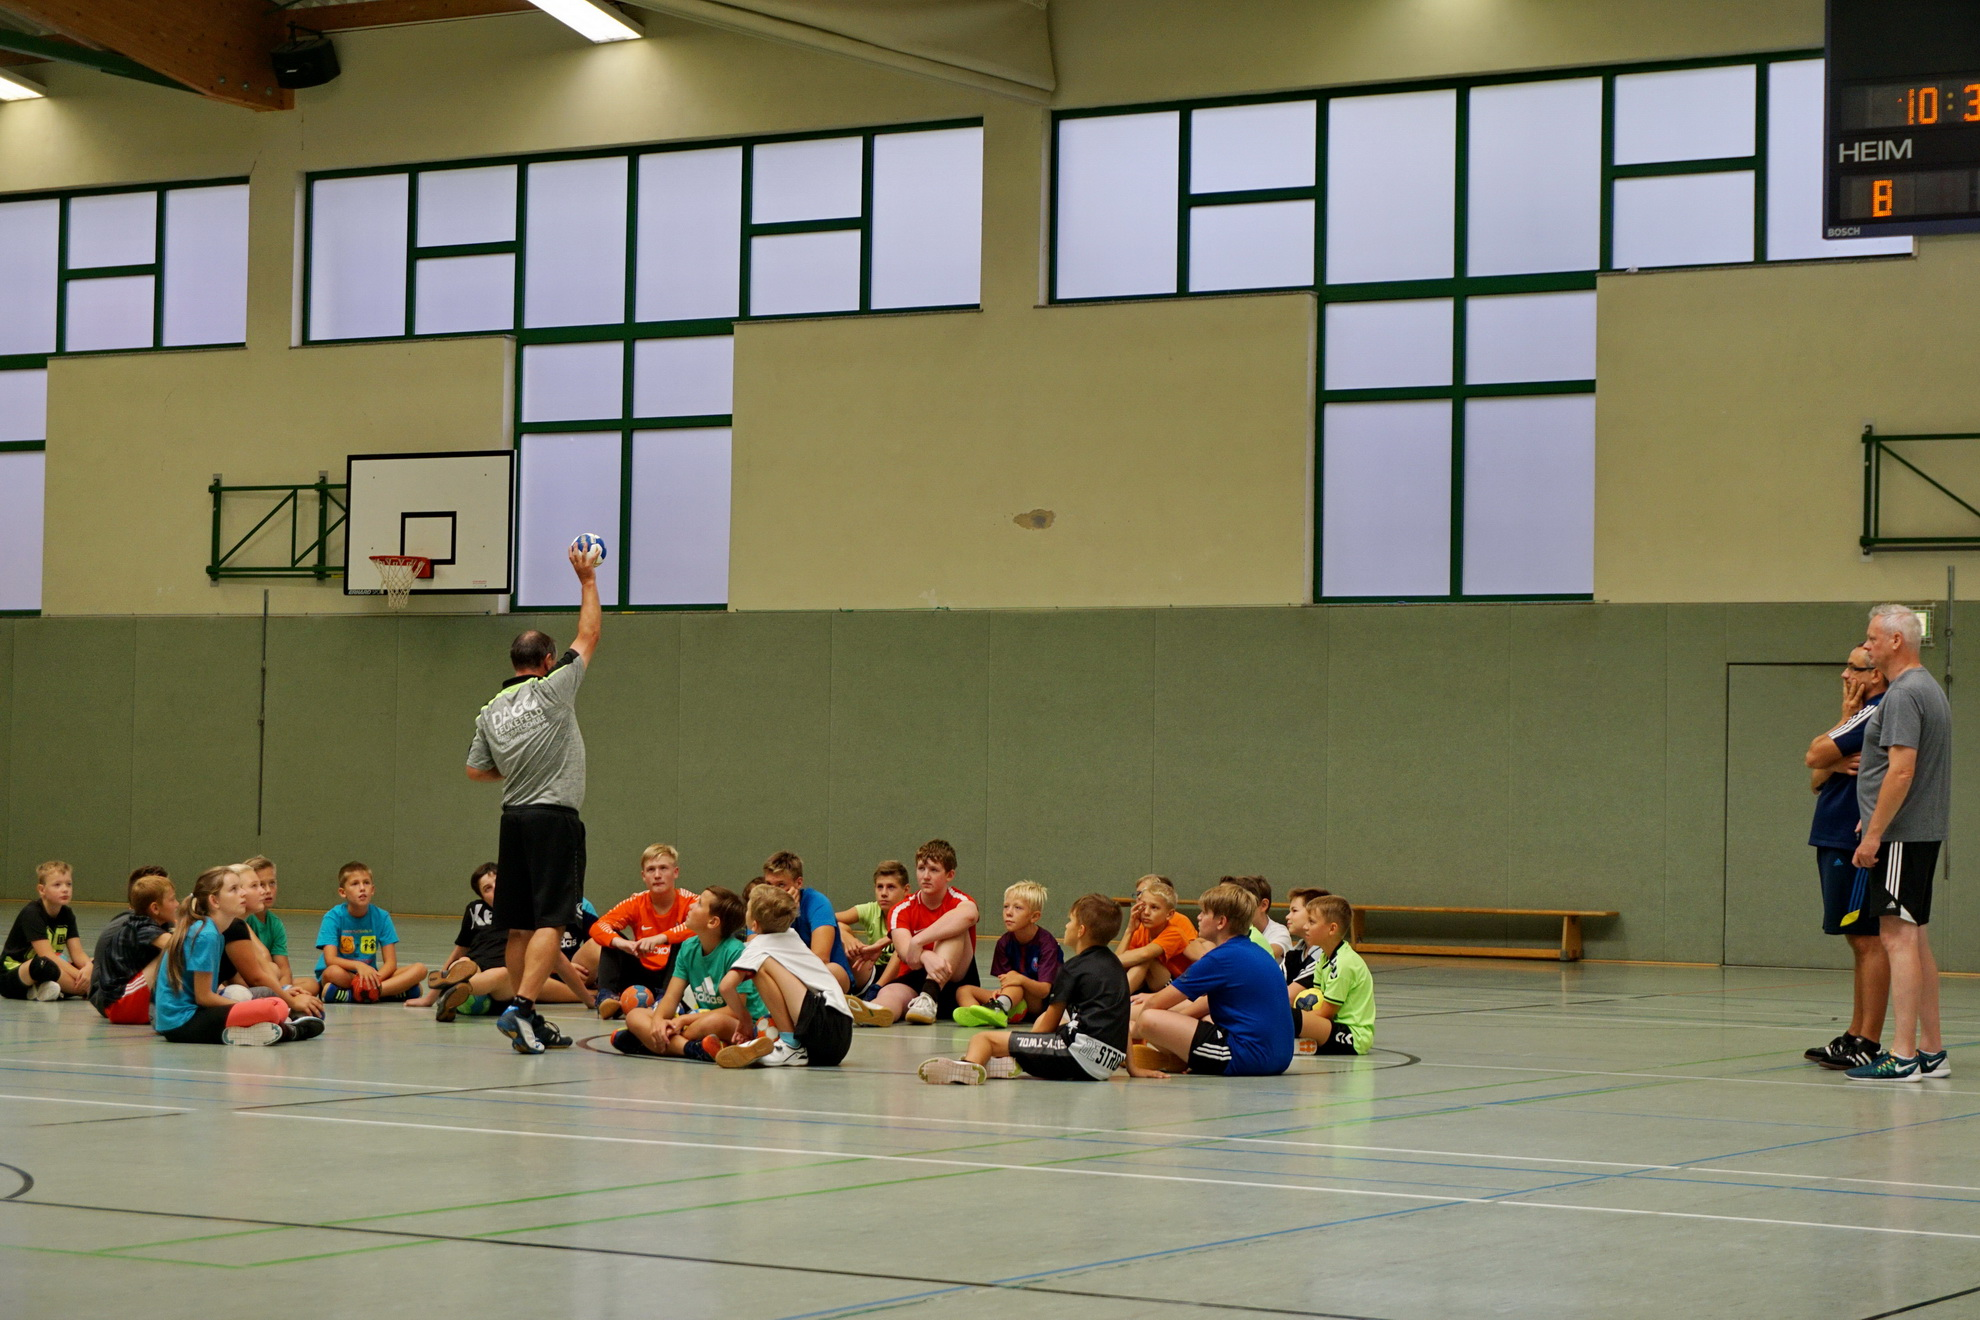 201808_Handballcamp_SDH_MG_068w